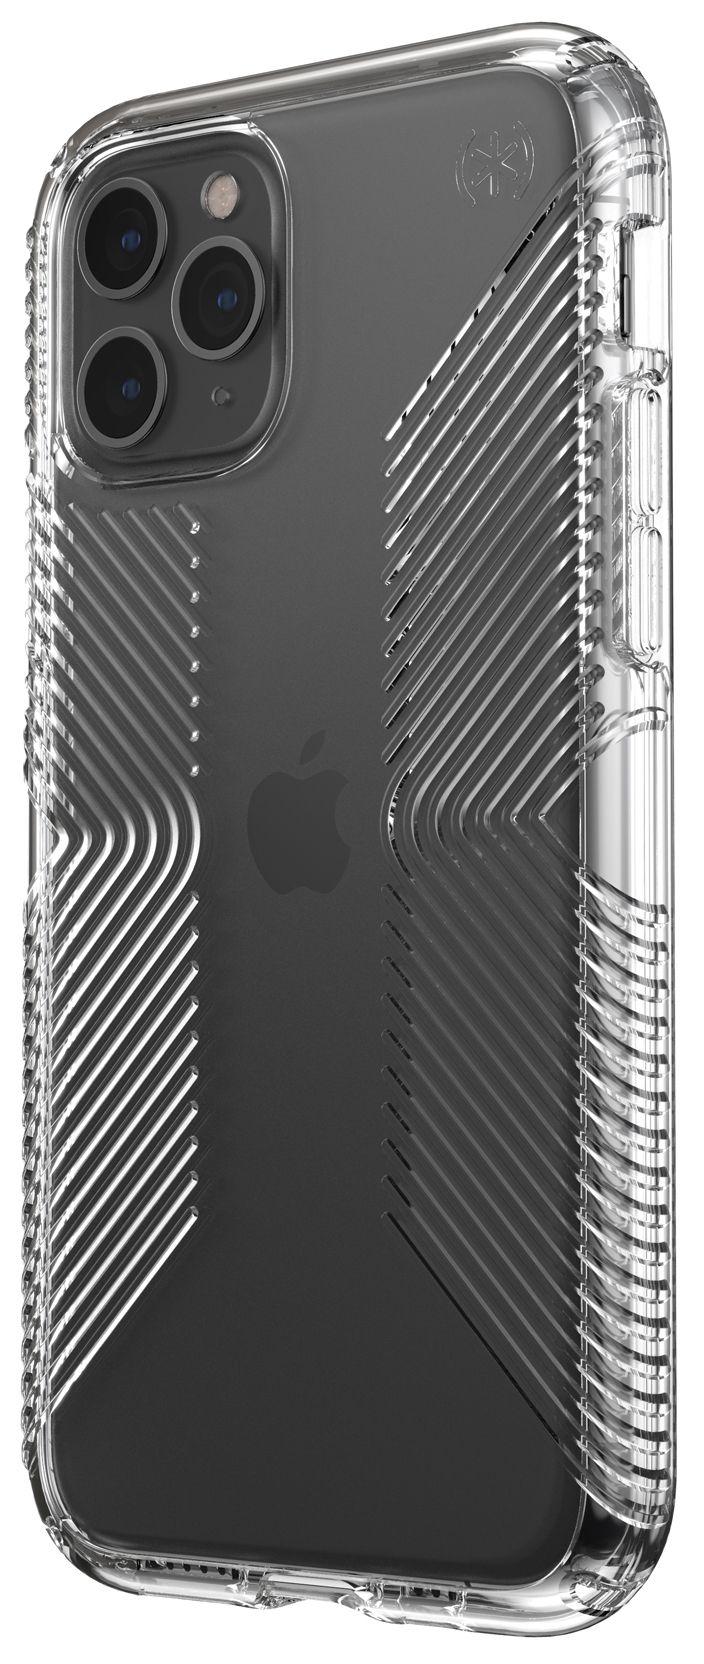 Калъф speck -  iPhone 11 PRO, Clear Grip, прозрачен - 2